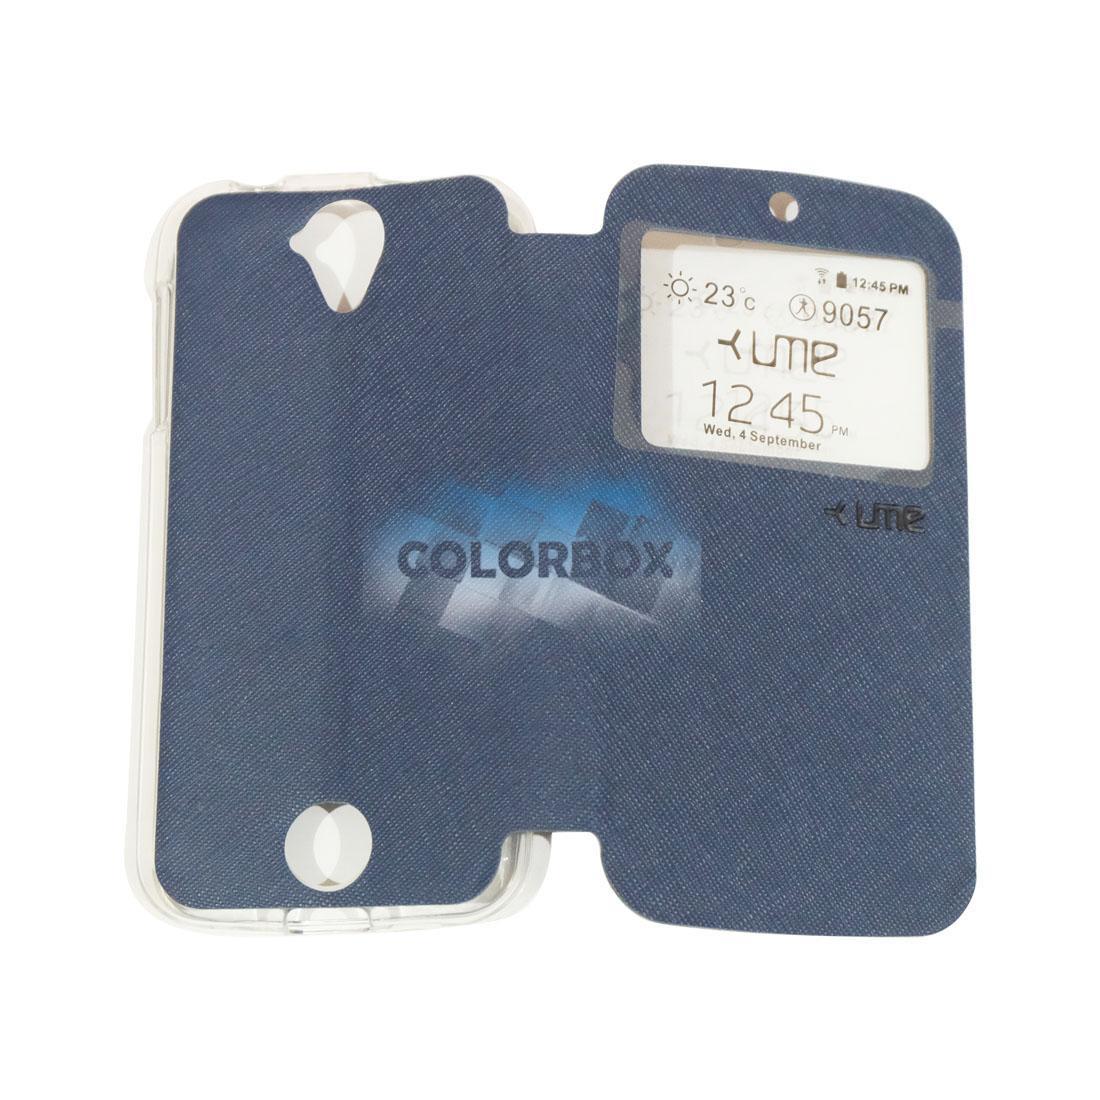 Ume Flip Leather Phone Cover Acer Liquid Z320 / Acer Z330 Ukuran 4.5 Inch Sarung Case / Flipshell Acer Liquid Z320 / FlipCover Acer Z330 Ukuran 4.5 Inch Ume / Leather Case Acer Z330 Ukuran 4.5 Inch / Sarung HP Acer Liquid Z320 Ume View - Biru Tua